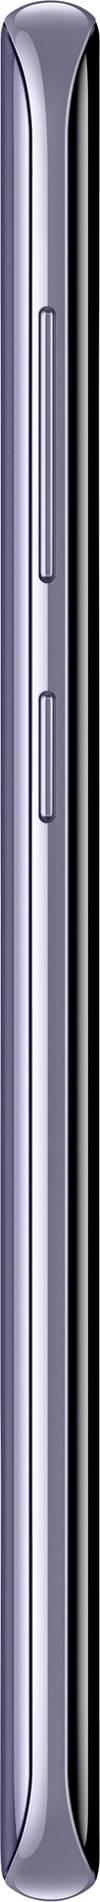 Samsung Galaxy S8 Single-SIM LTE-Smartphone 14....